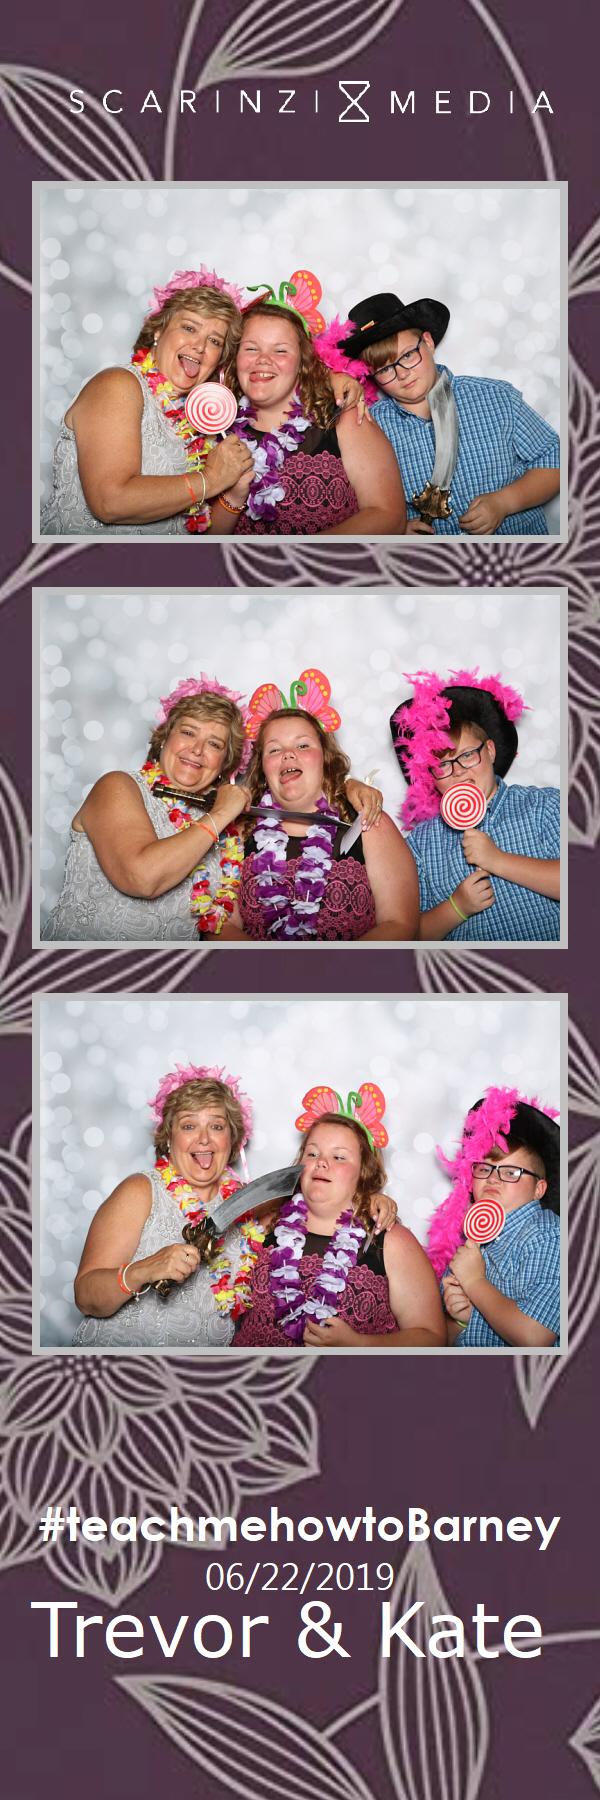 2019.06.22 - Barney Wedding PHOTOBOOTH68.jpg